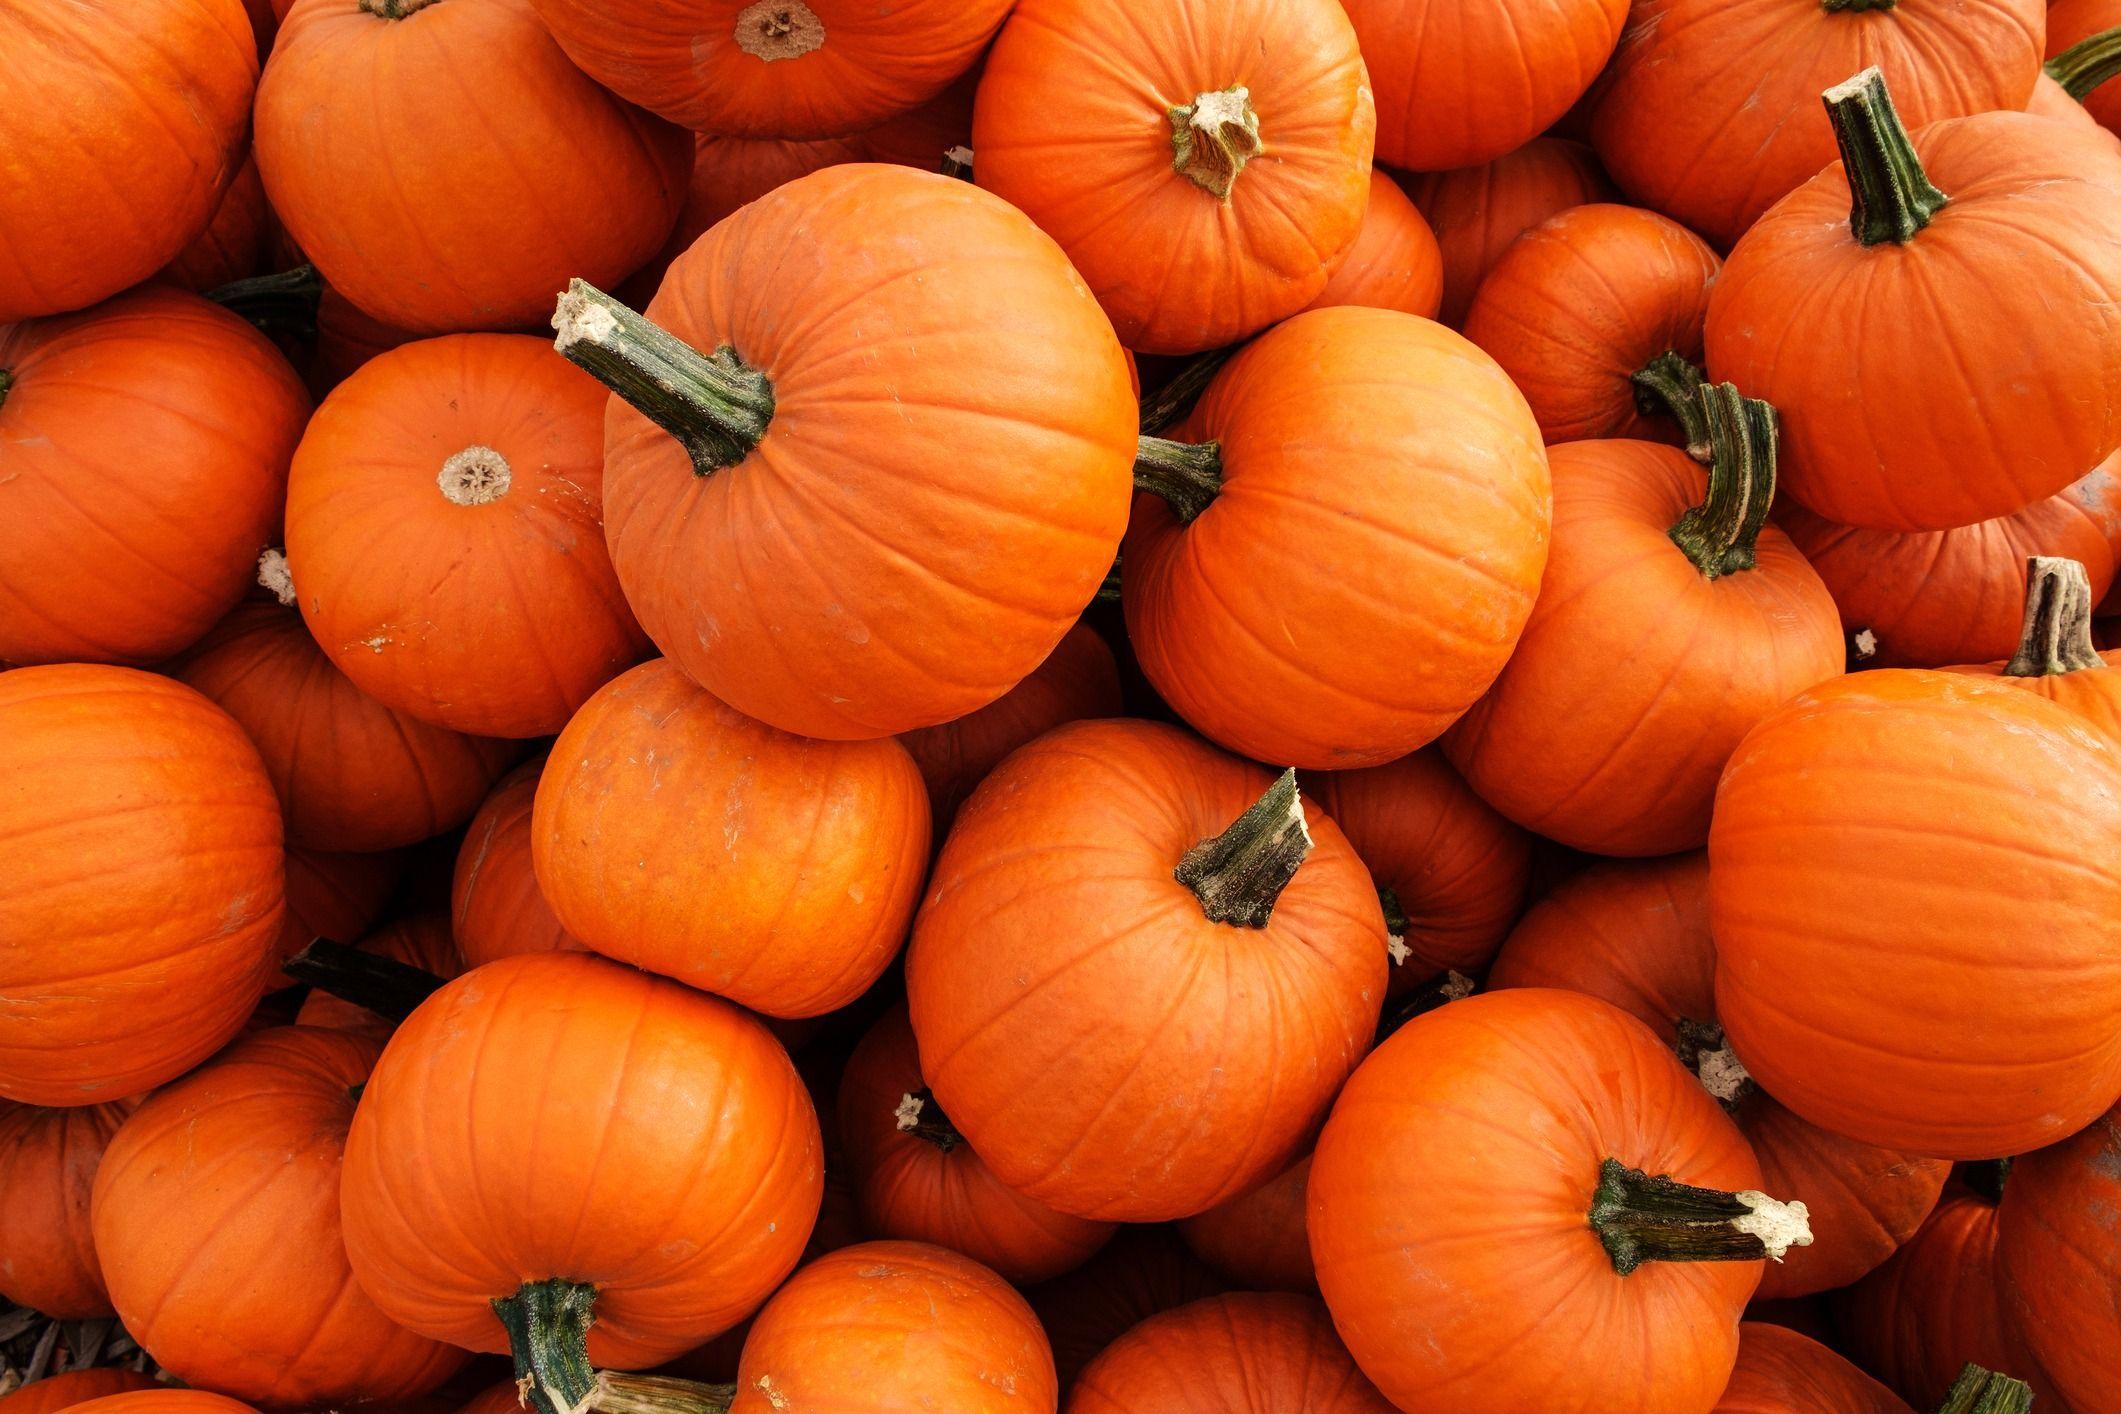 jack olantern pumpkins can be kosher says ashley blaker u2013 the forward